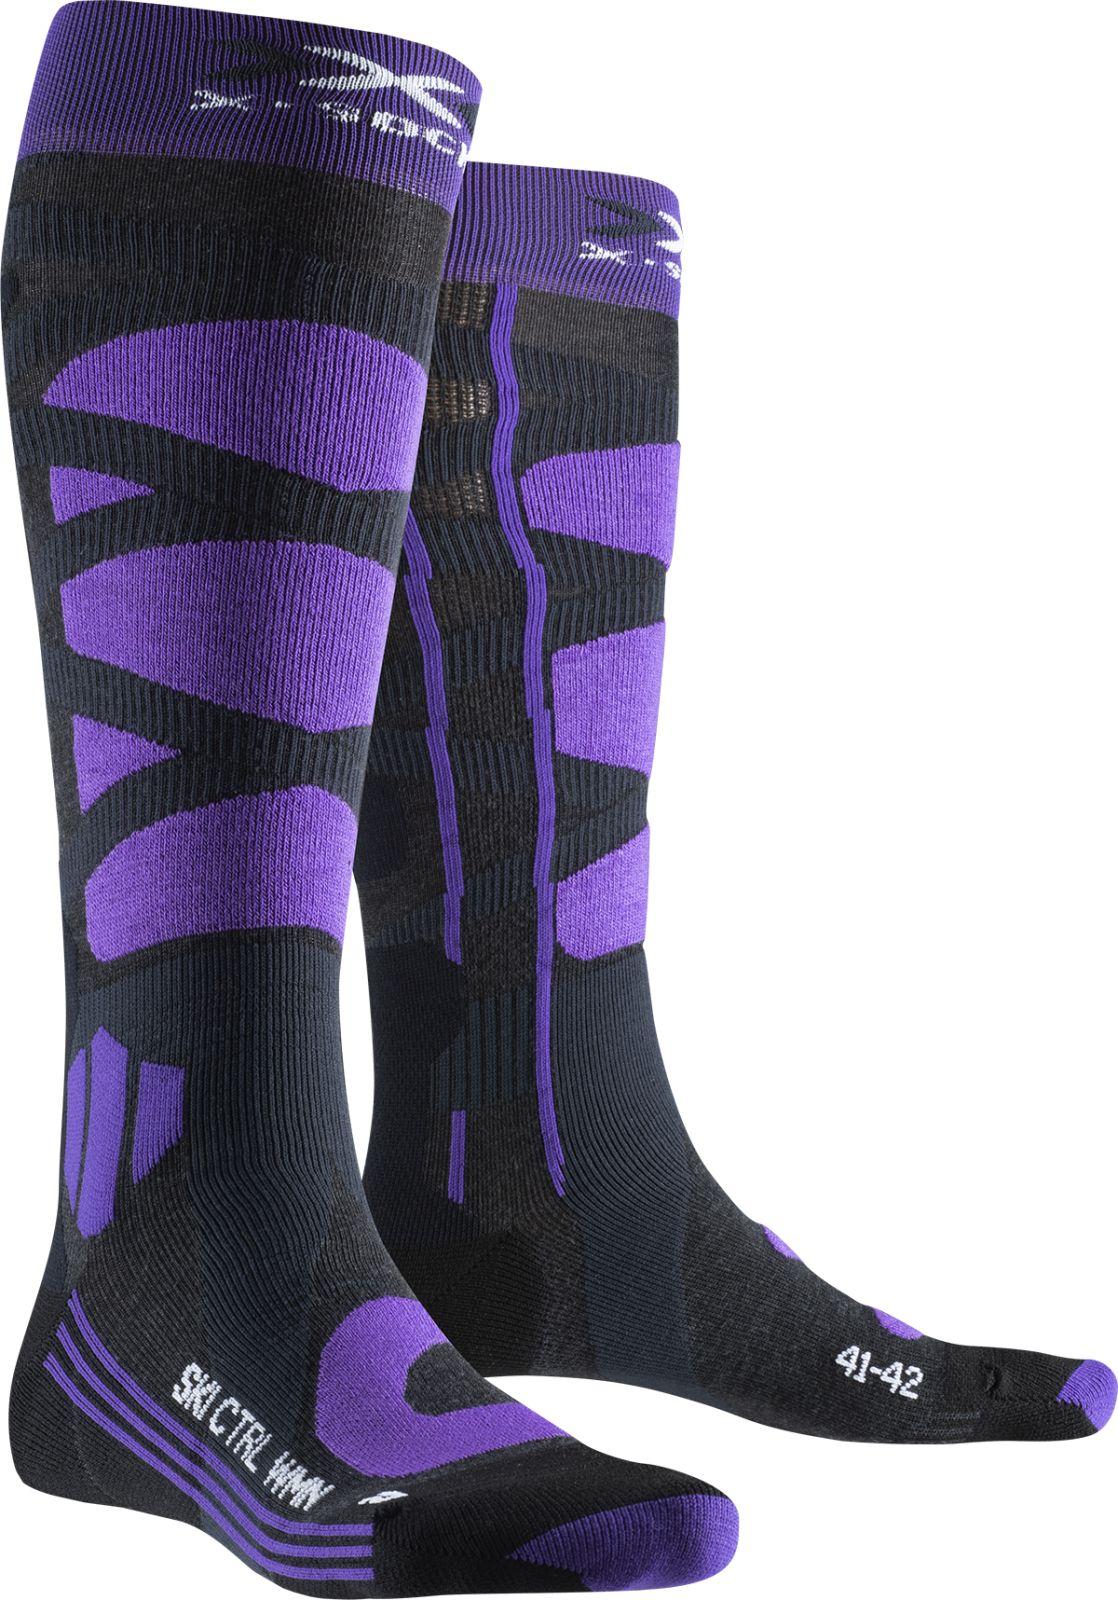 X-Socks Ski Control 4.0 Wmn - charcoal melange/purple 39-40